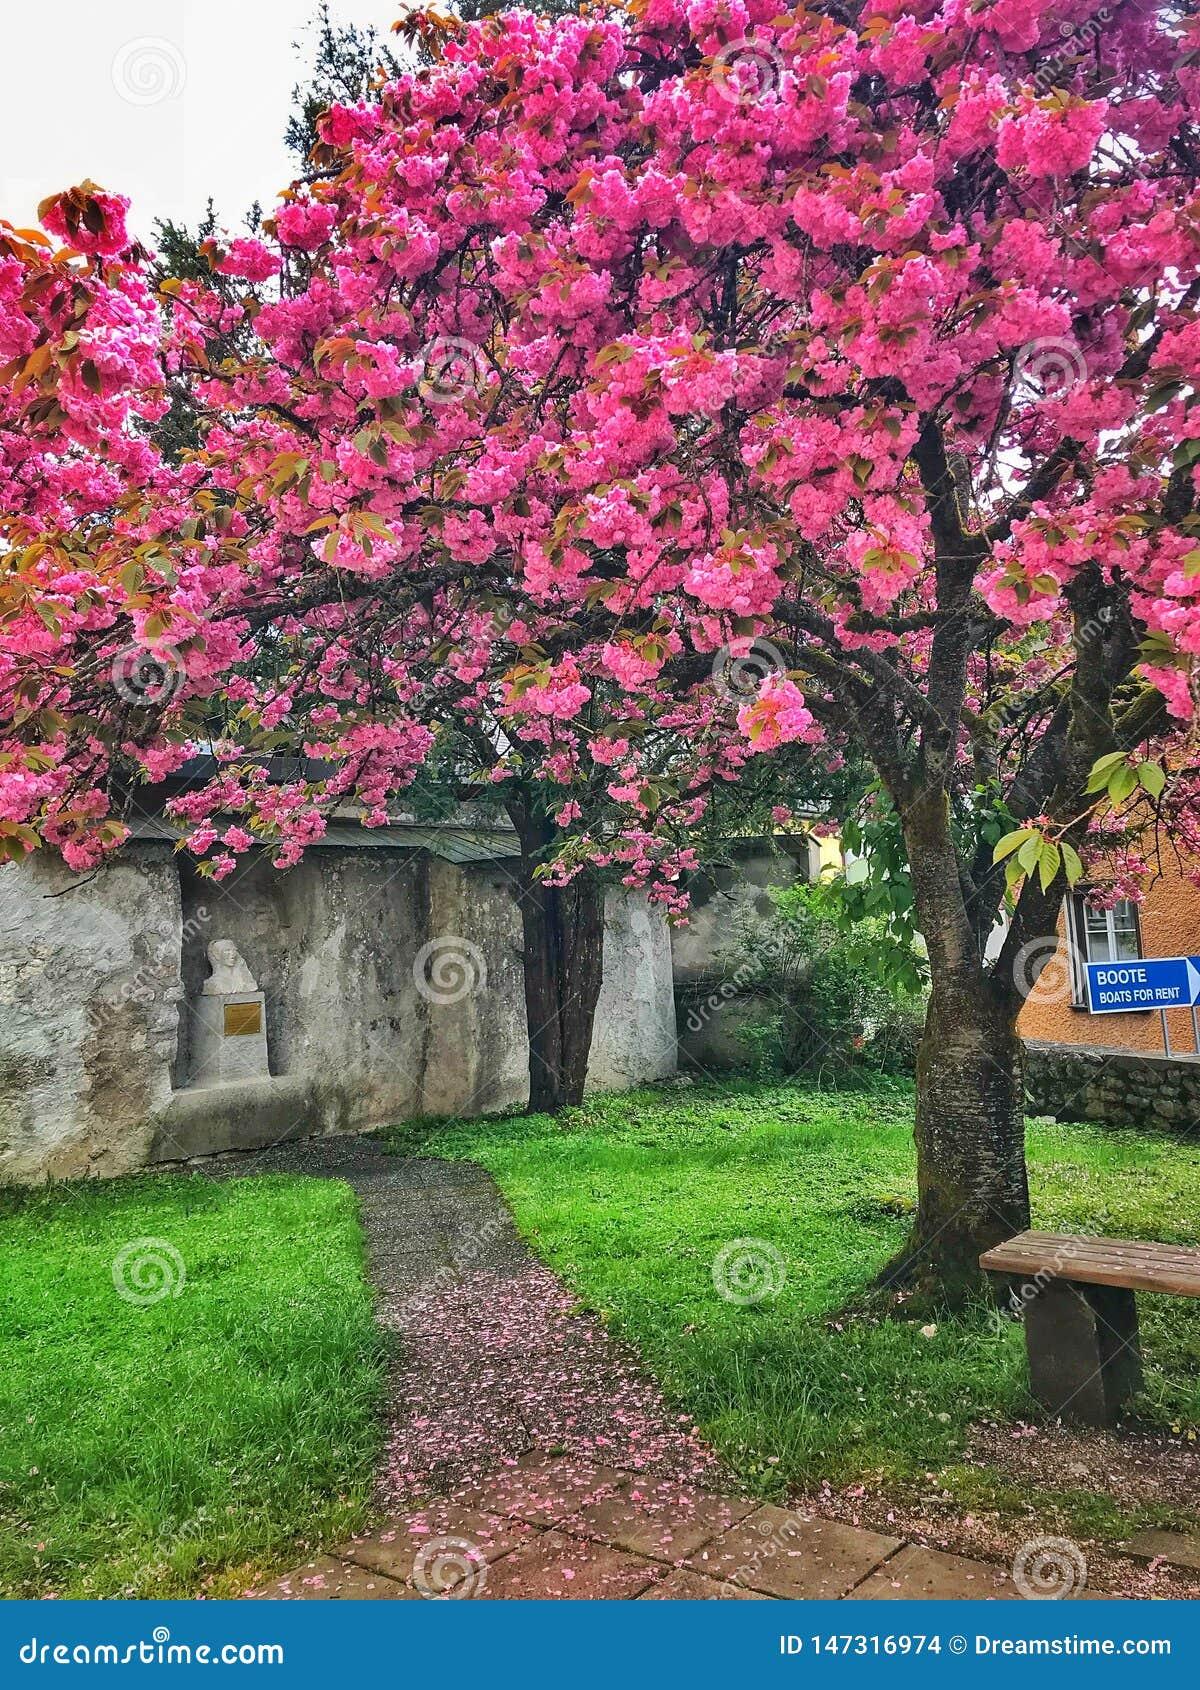 The beautiful pink tree,green grass in amazing Austria